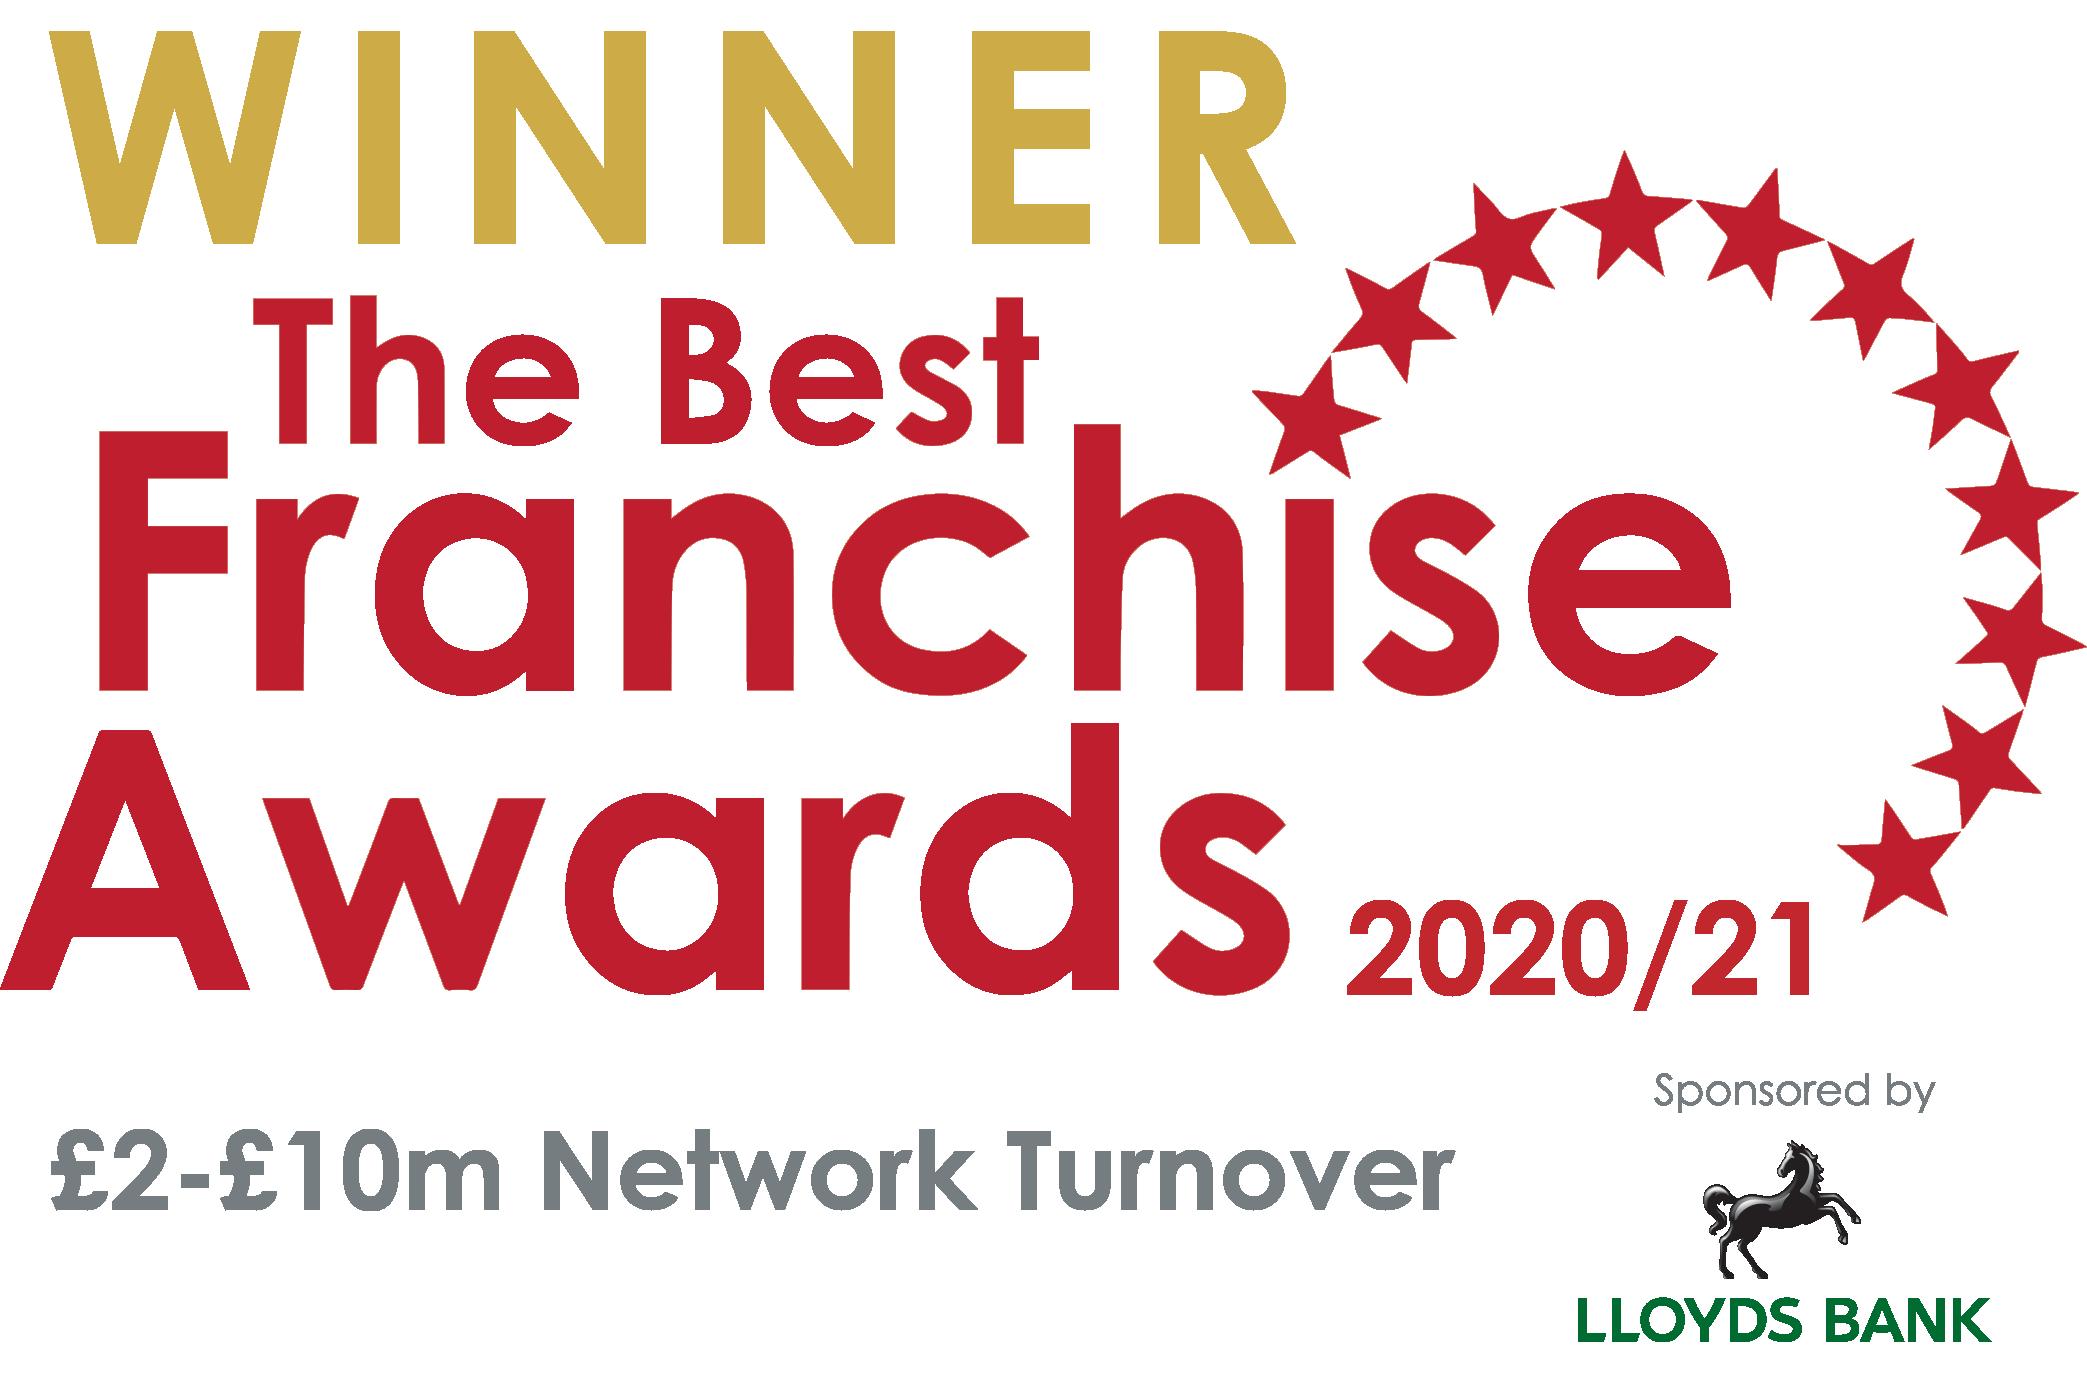 Winners of the Best Franchise Awards 2020/21